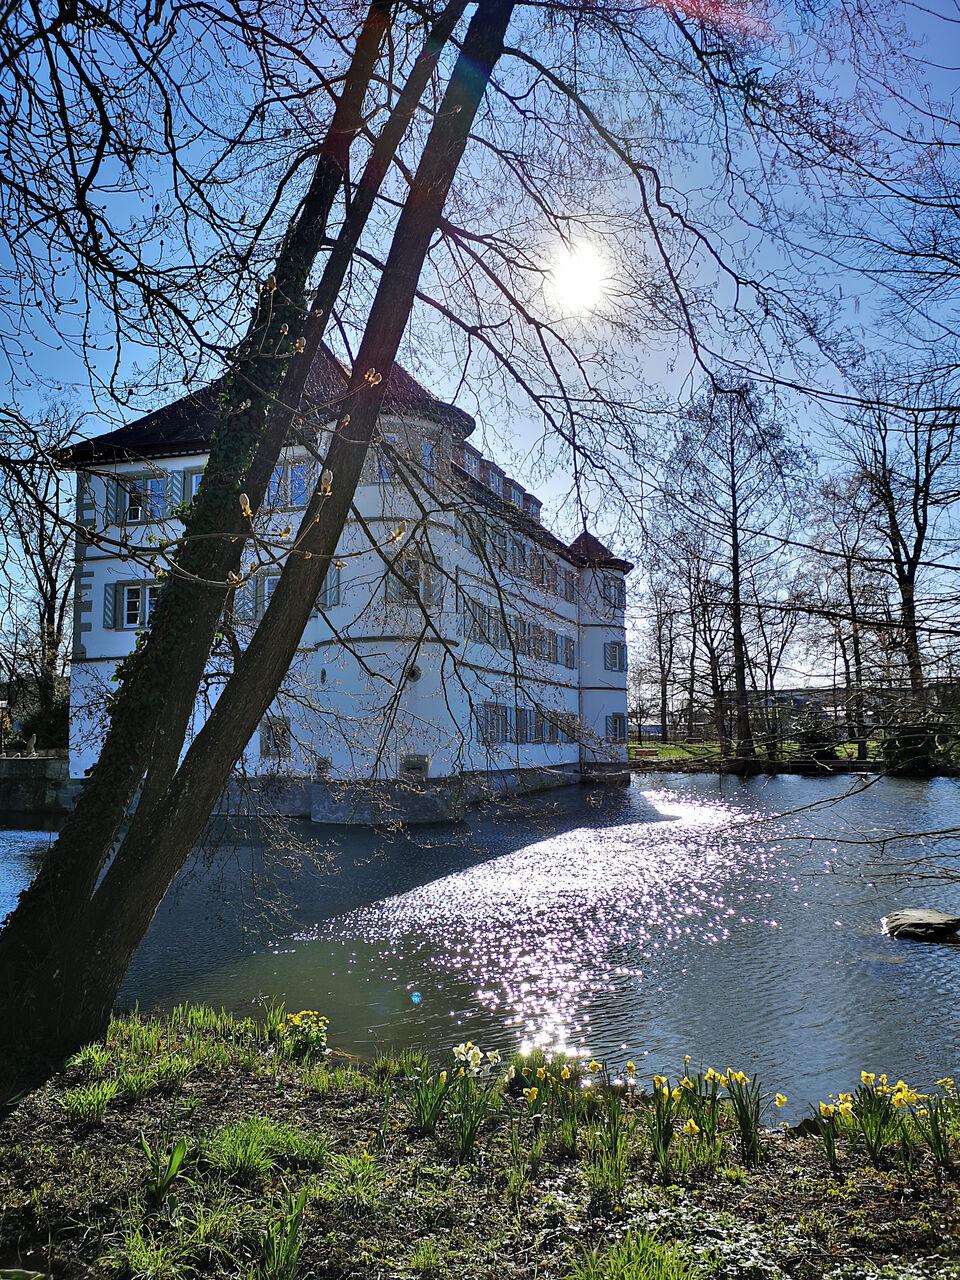 20200322_Schlosspark_in_Bad_Rappenau_004